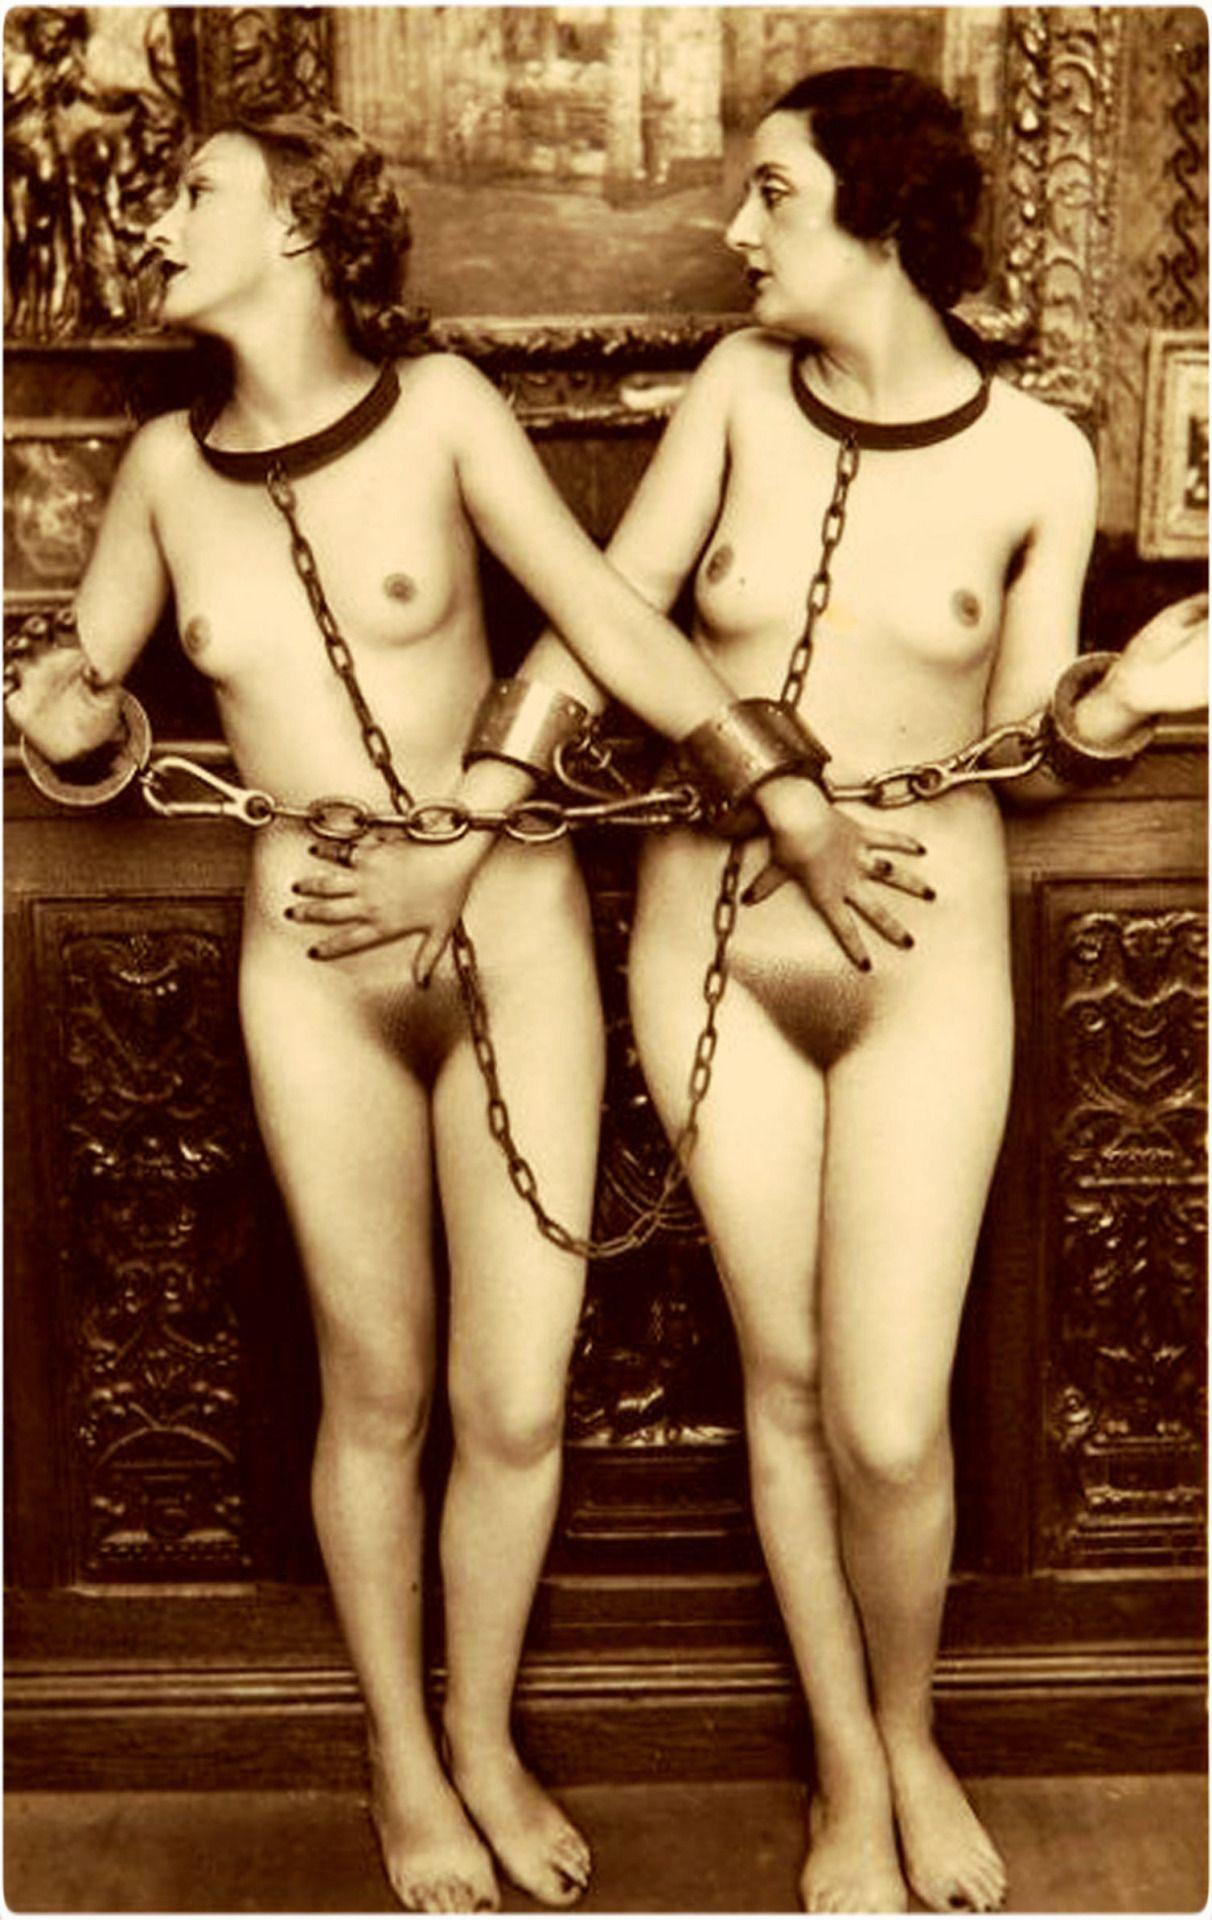 Miss usas stripper pole past